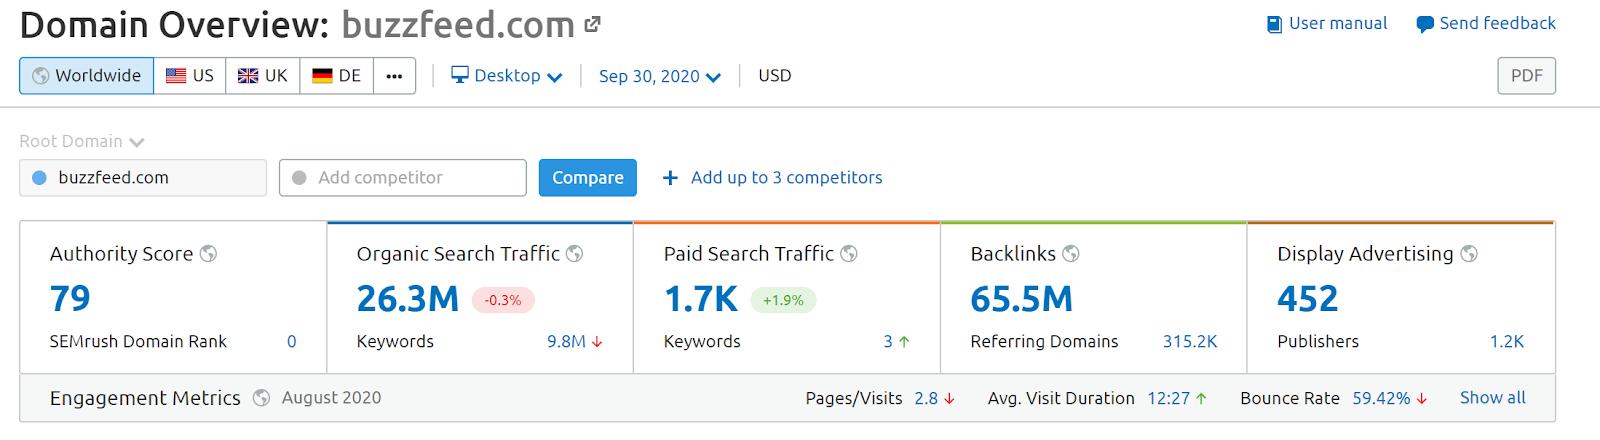 Buzzfeed SEMrush Domain Overview screenshot